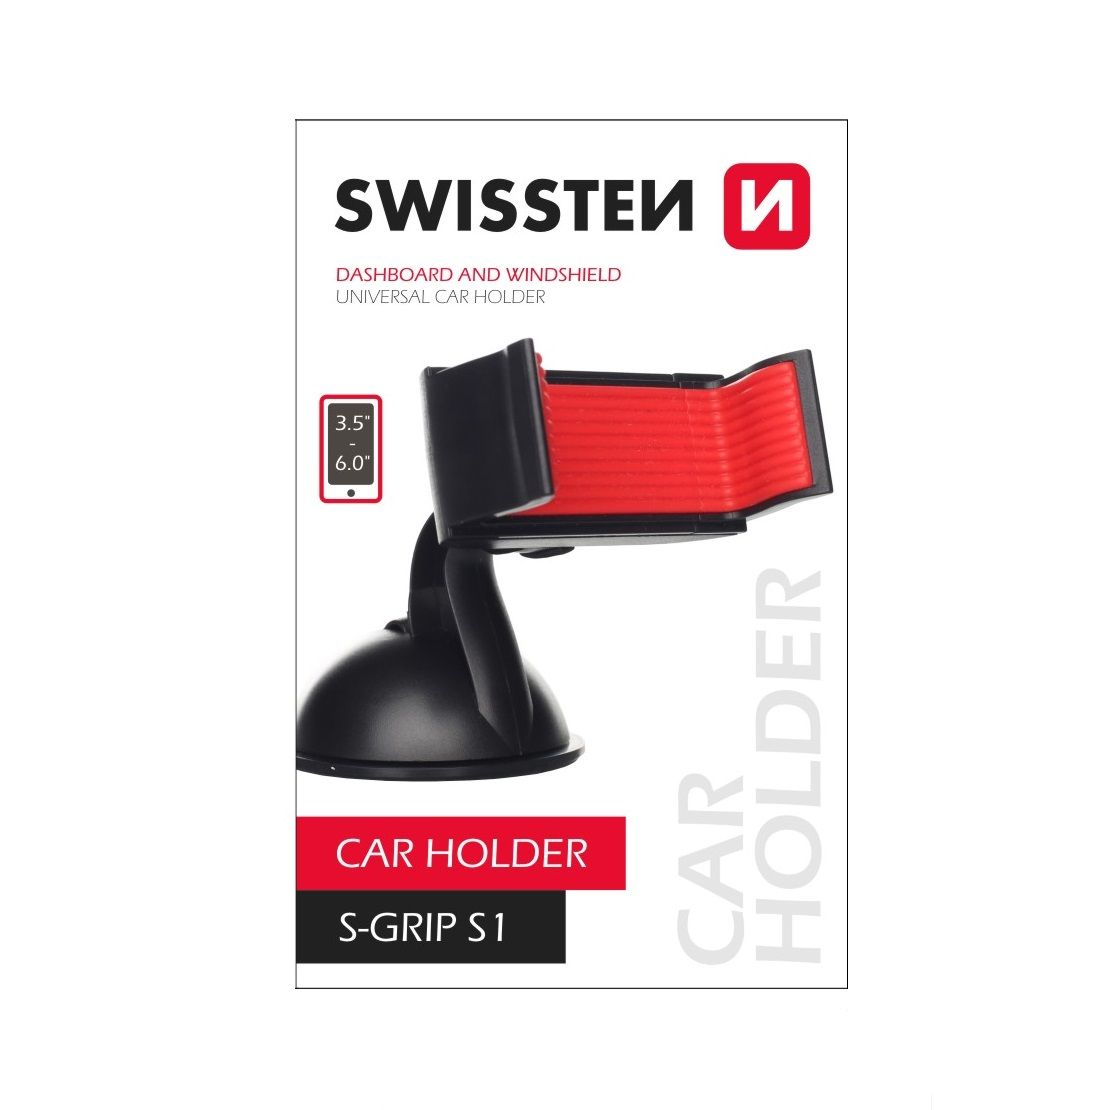 Swissten držiak do auta univerzálny s nano podložkou, S-GRIP S1 (Blister)